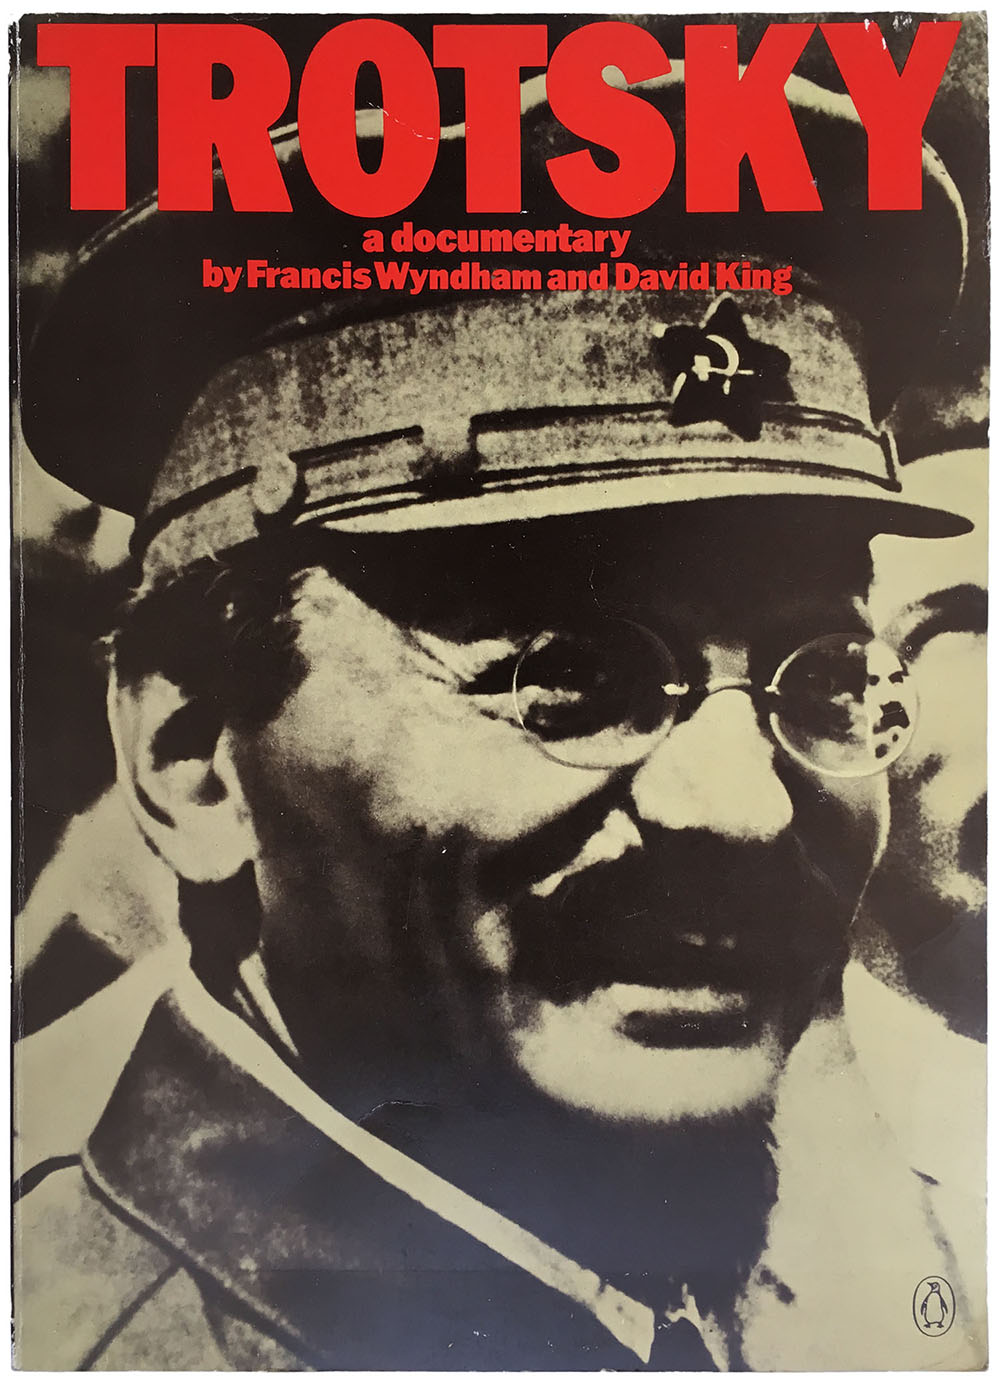 """Trotsky: A Documentary"" by Francis Wyndham and David King. Praeger, 1972."